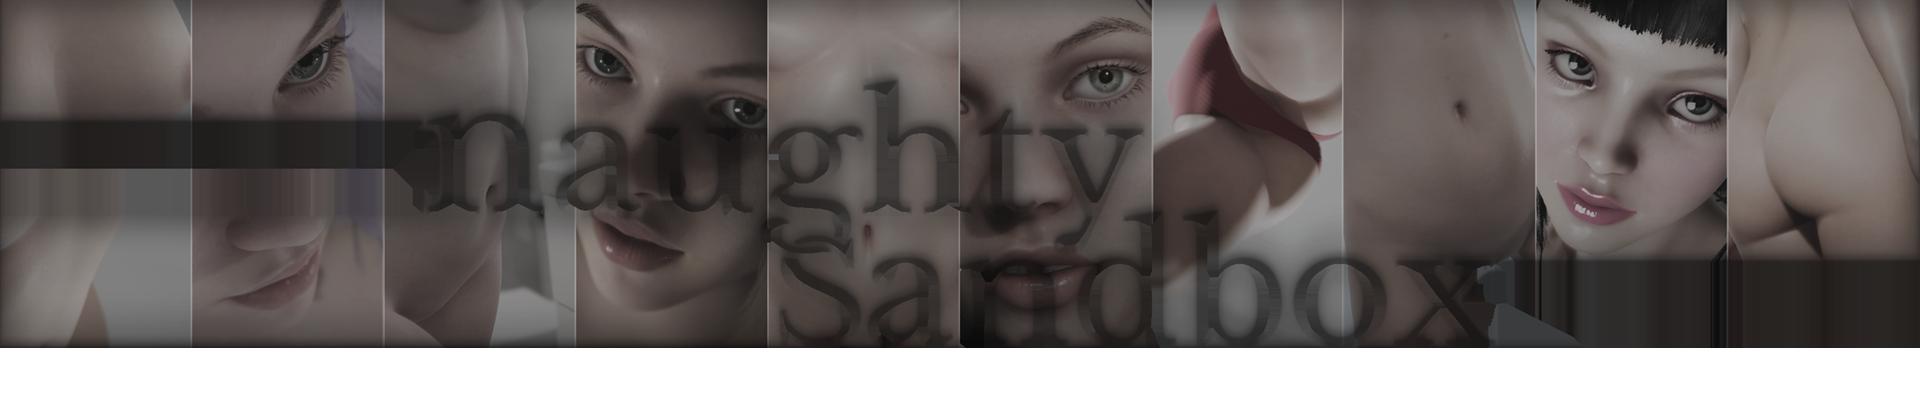 Naughty Sandbox: Beach Island Environment